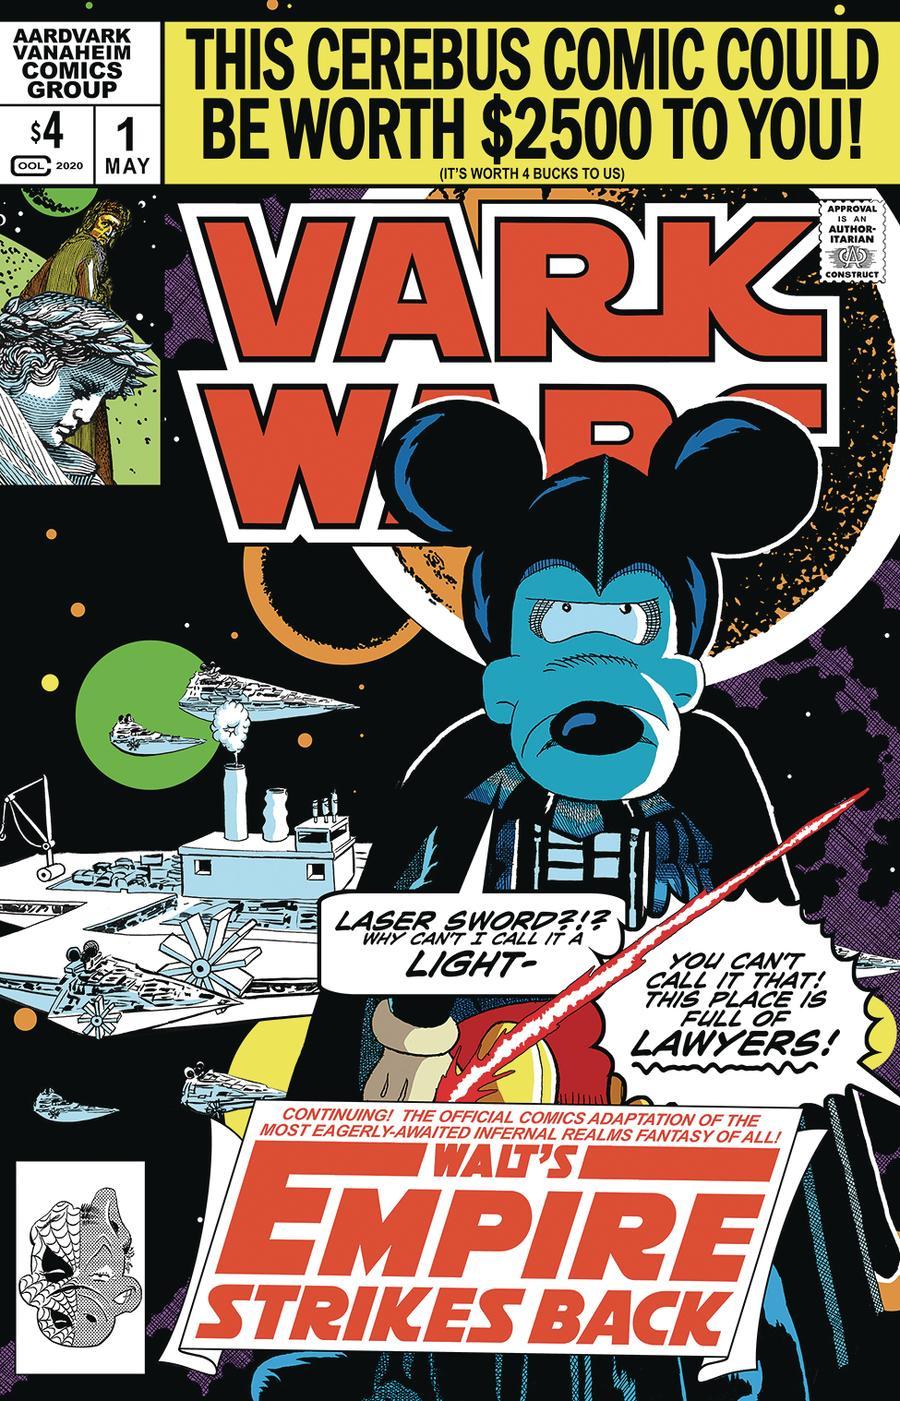 Vark Wars Walts Empire Strikes Back One Shot